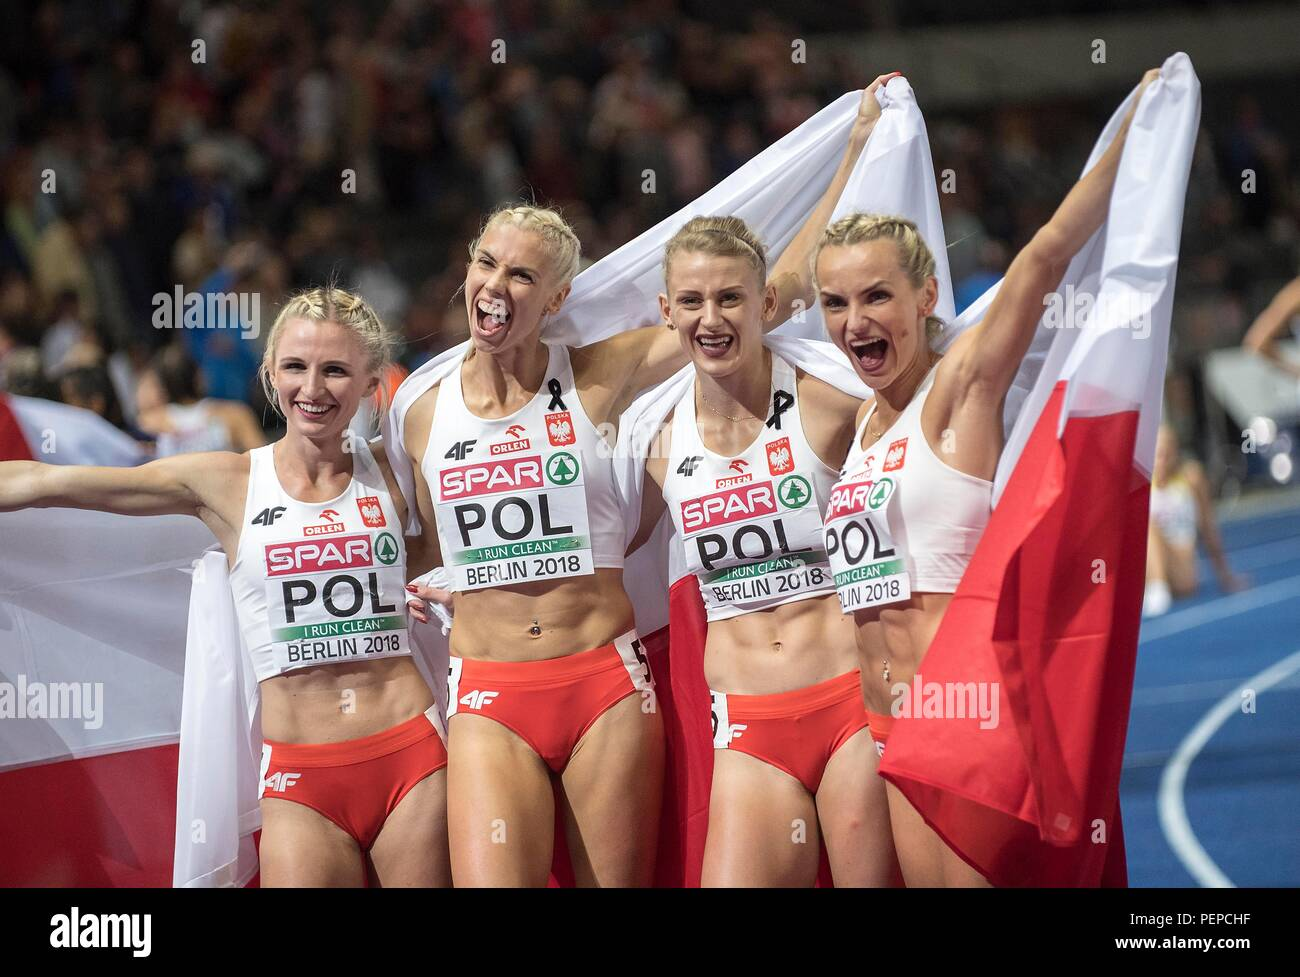 Berlin, Deutschland. 11th Aug, 2018. jubilation Team POL, 1st place, winner, with Malgorzata HOLUB-KOWALIK, Iga BAUMGART-WITAN, Patrycja WYCISZKIEWICZ, Justyna SWIETY-ERSETIC, Poland, final 4x400m women's relay, on 11.08.2018 European Athletics Championships 2018 in Berlin/Germany from 06.08, - 12.08.2018. | usage worldwide Credit: dpa/Alamy Live News - Stock Image